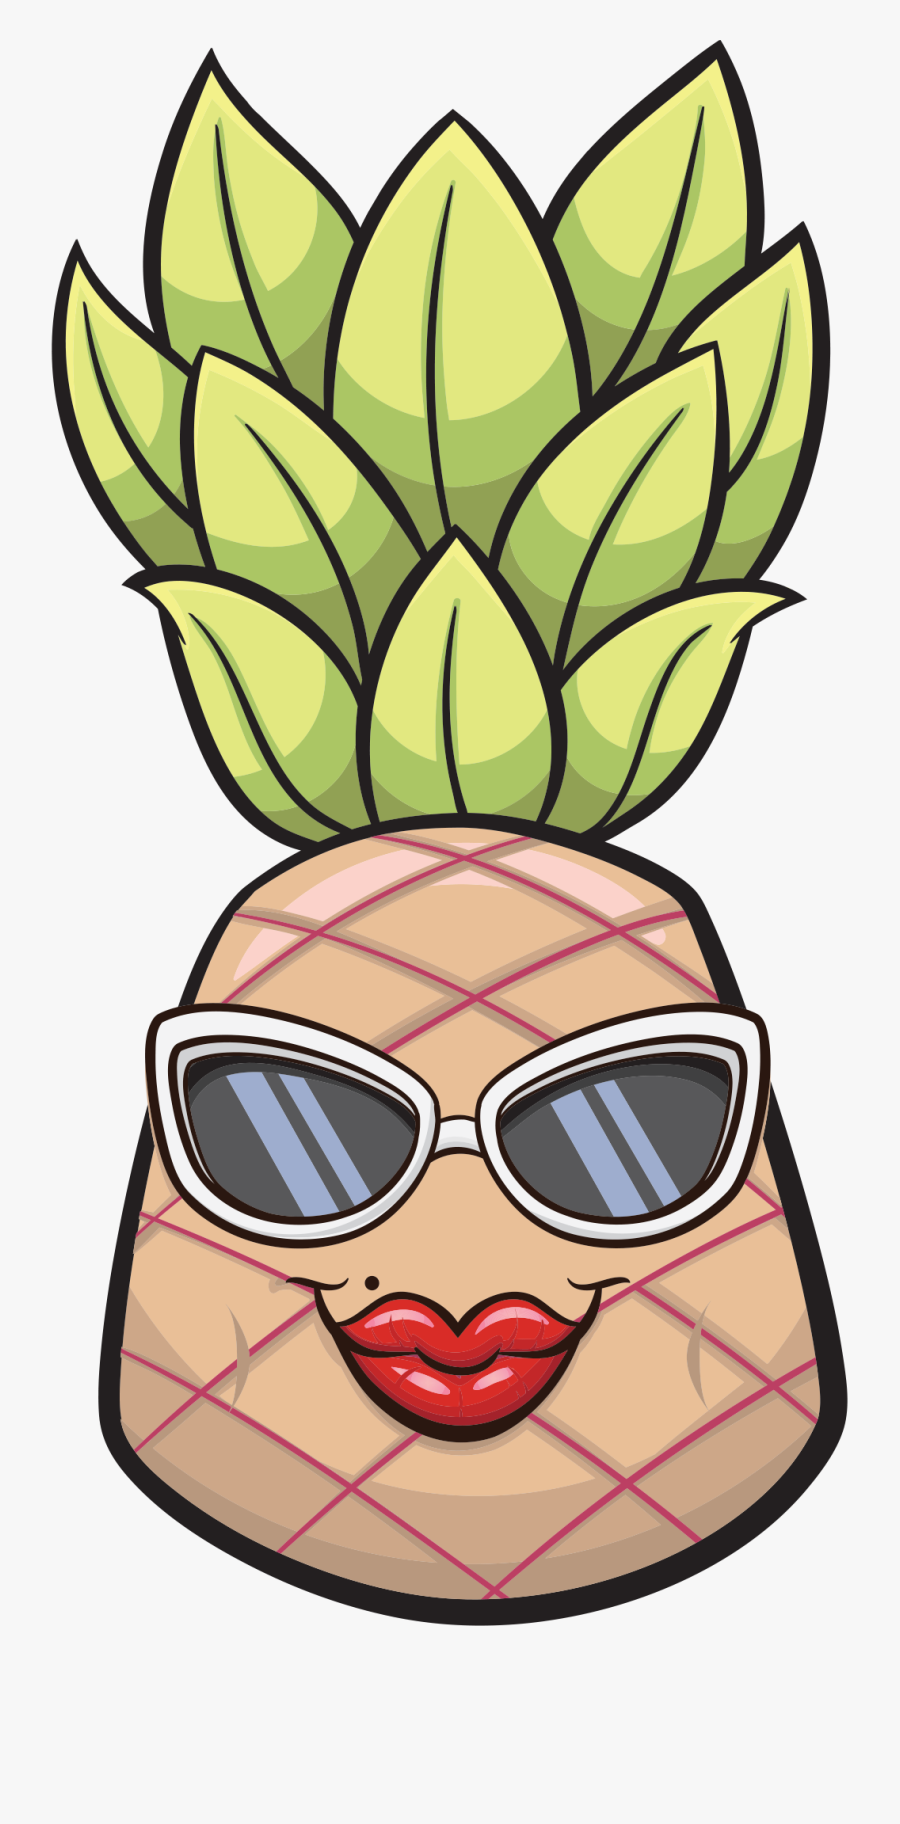 2019 Pineapple Hospitality - Illustration, Transparent Clipart